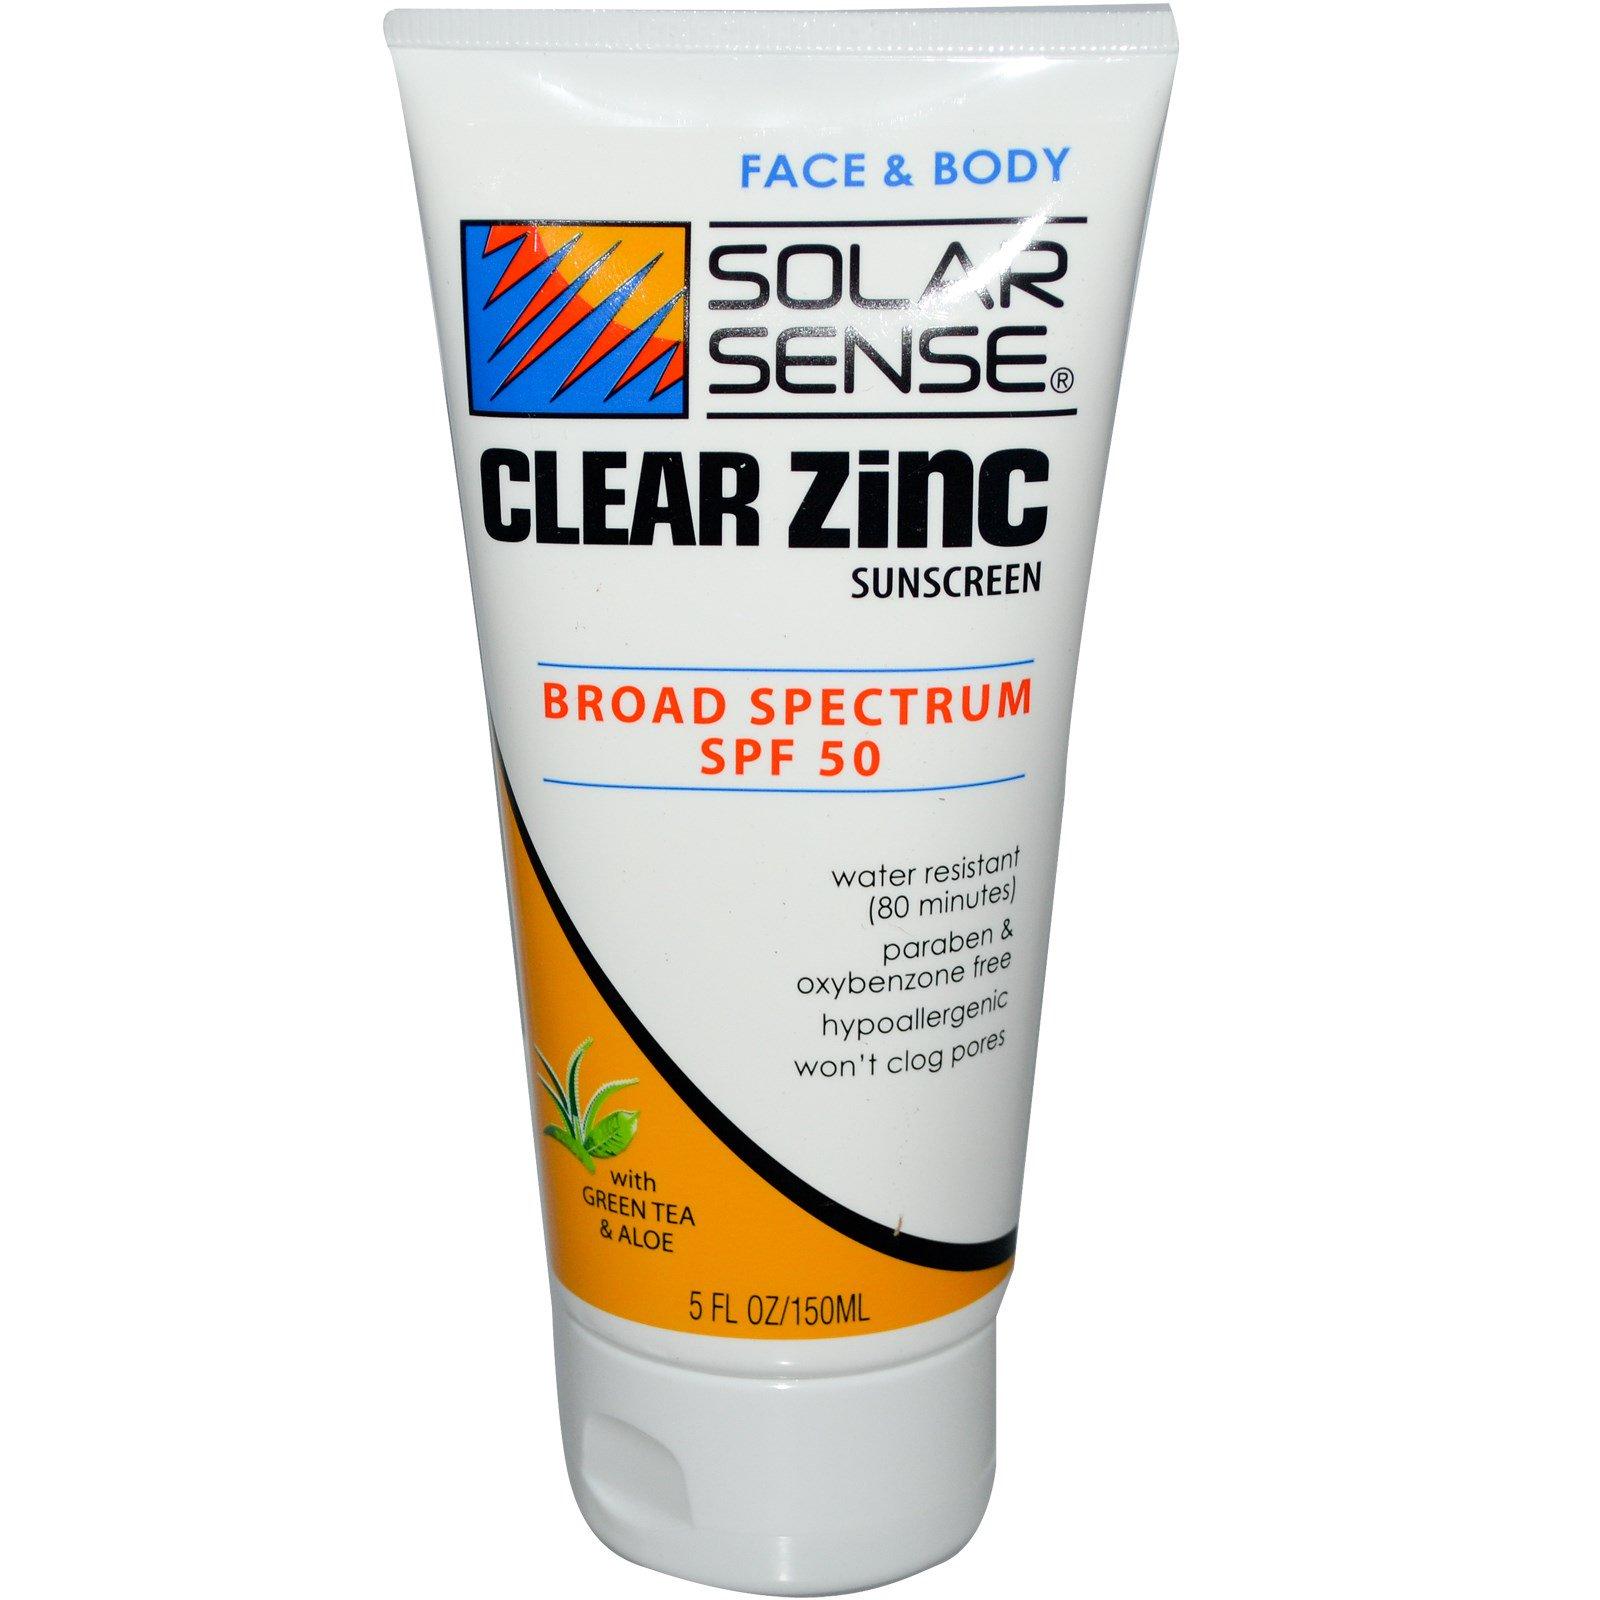 Face sunscreen with zinc